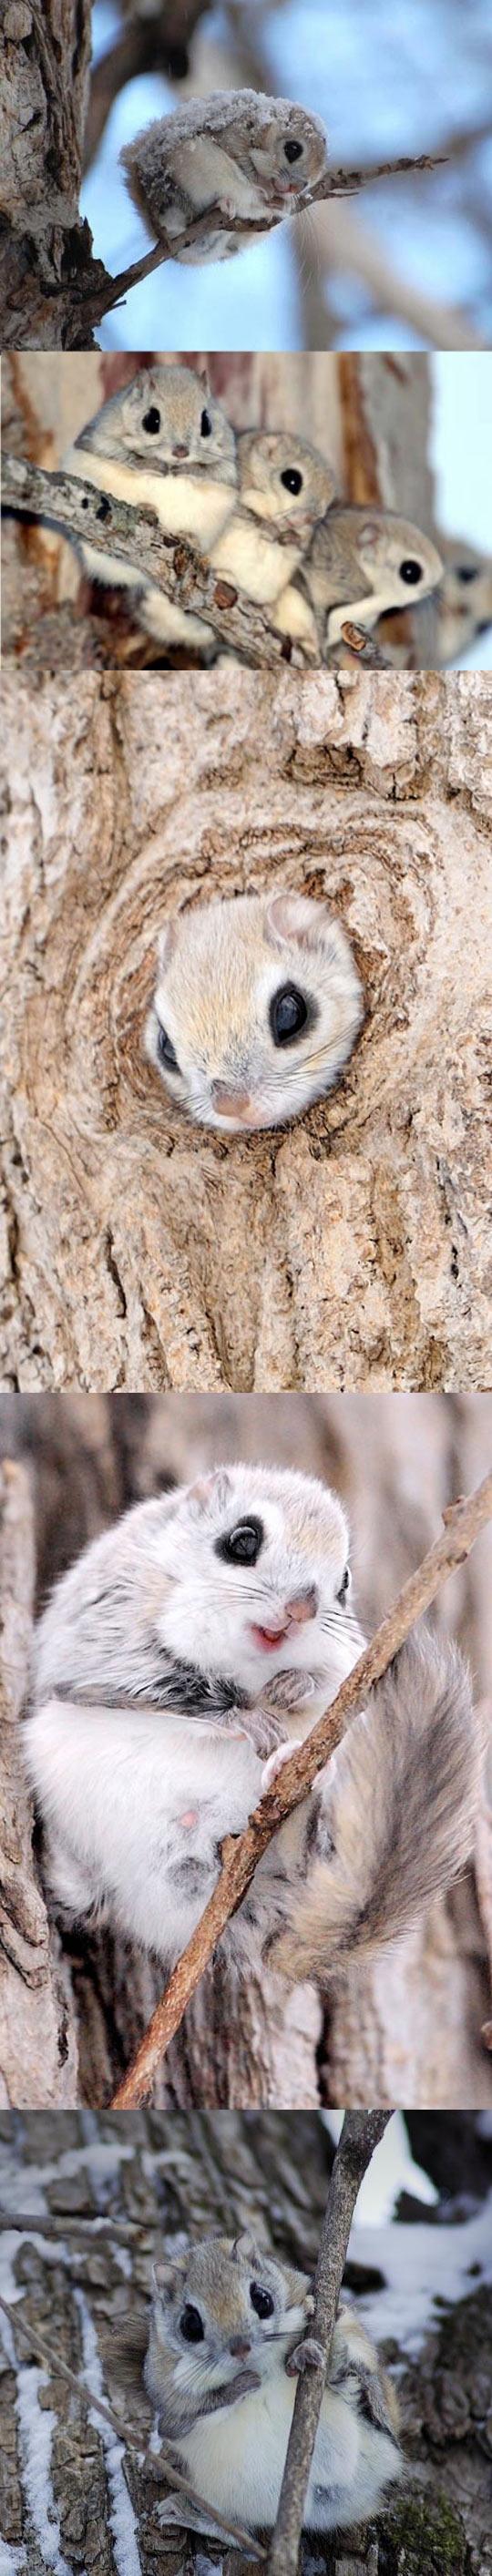 Cute Japanese Flying Squirrels